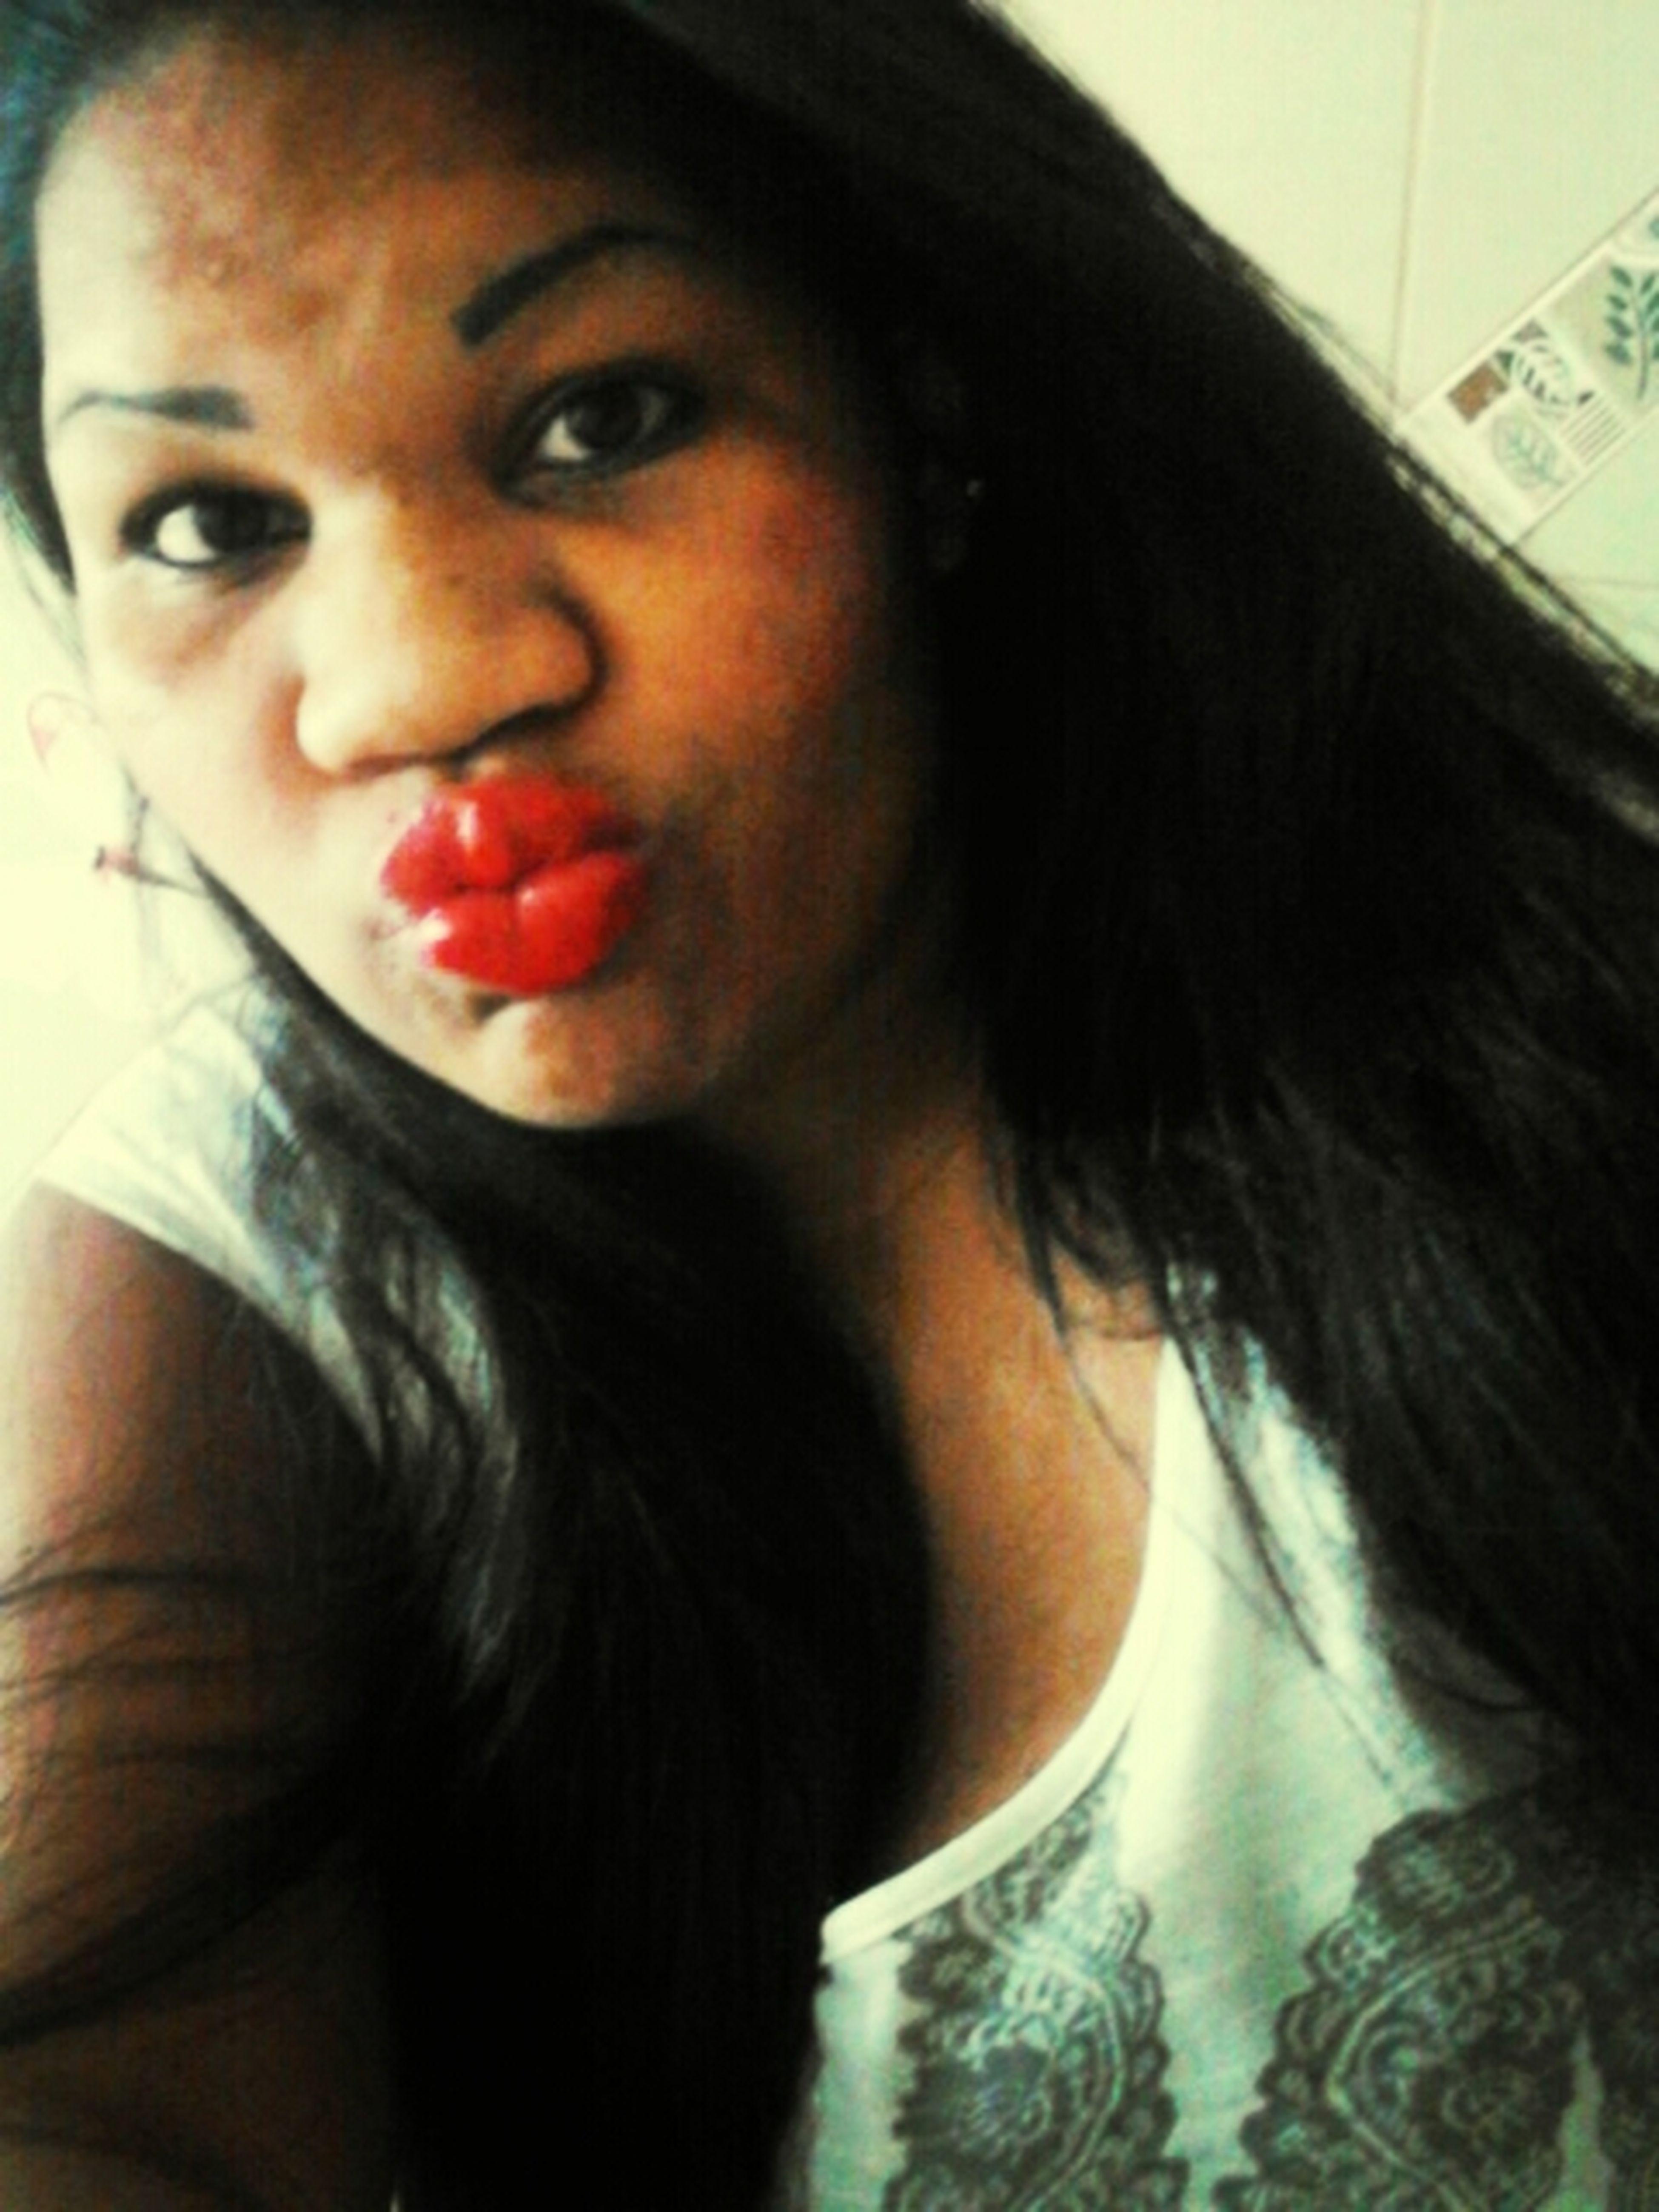 kiss # kisses #kiss